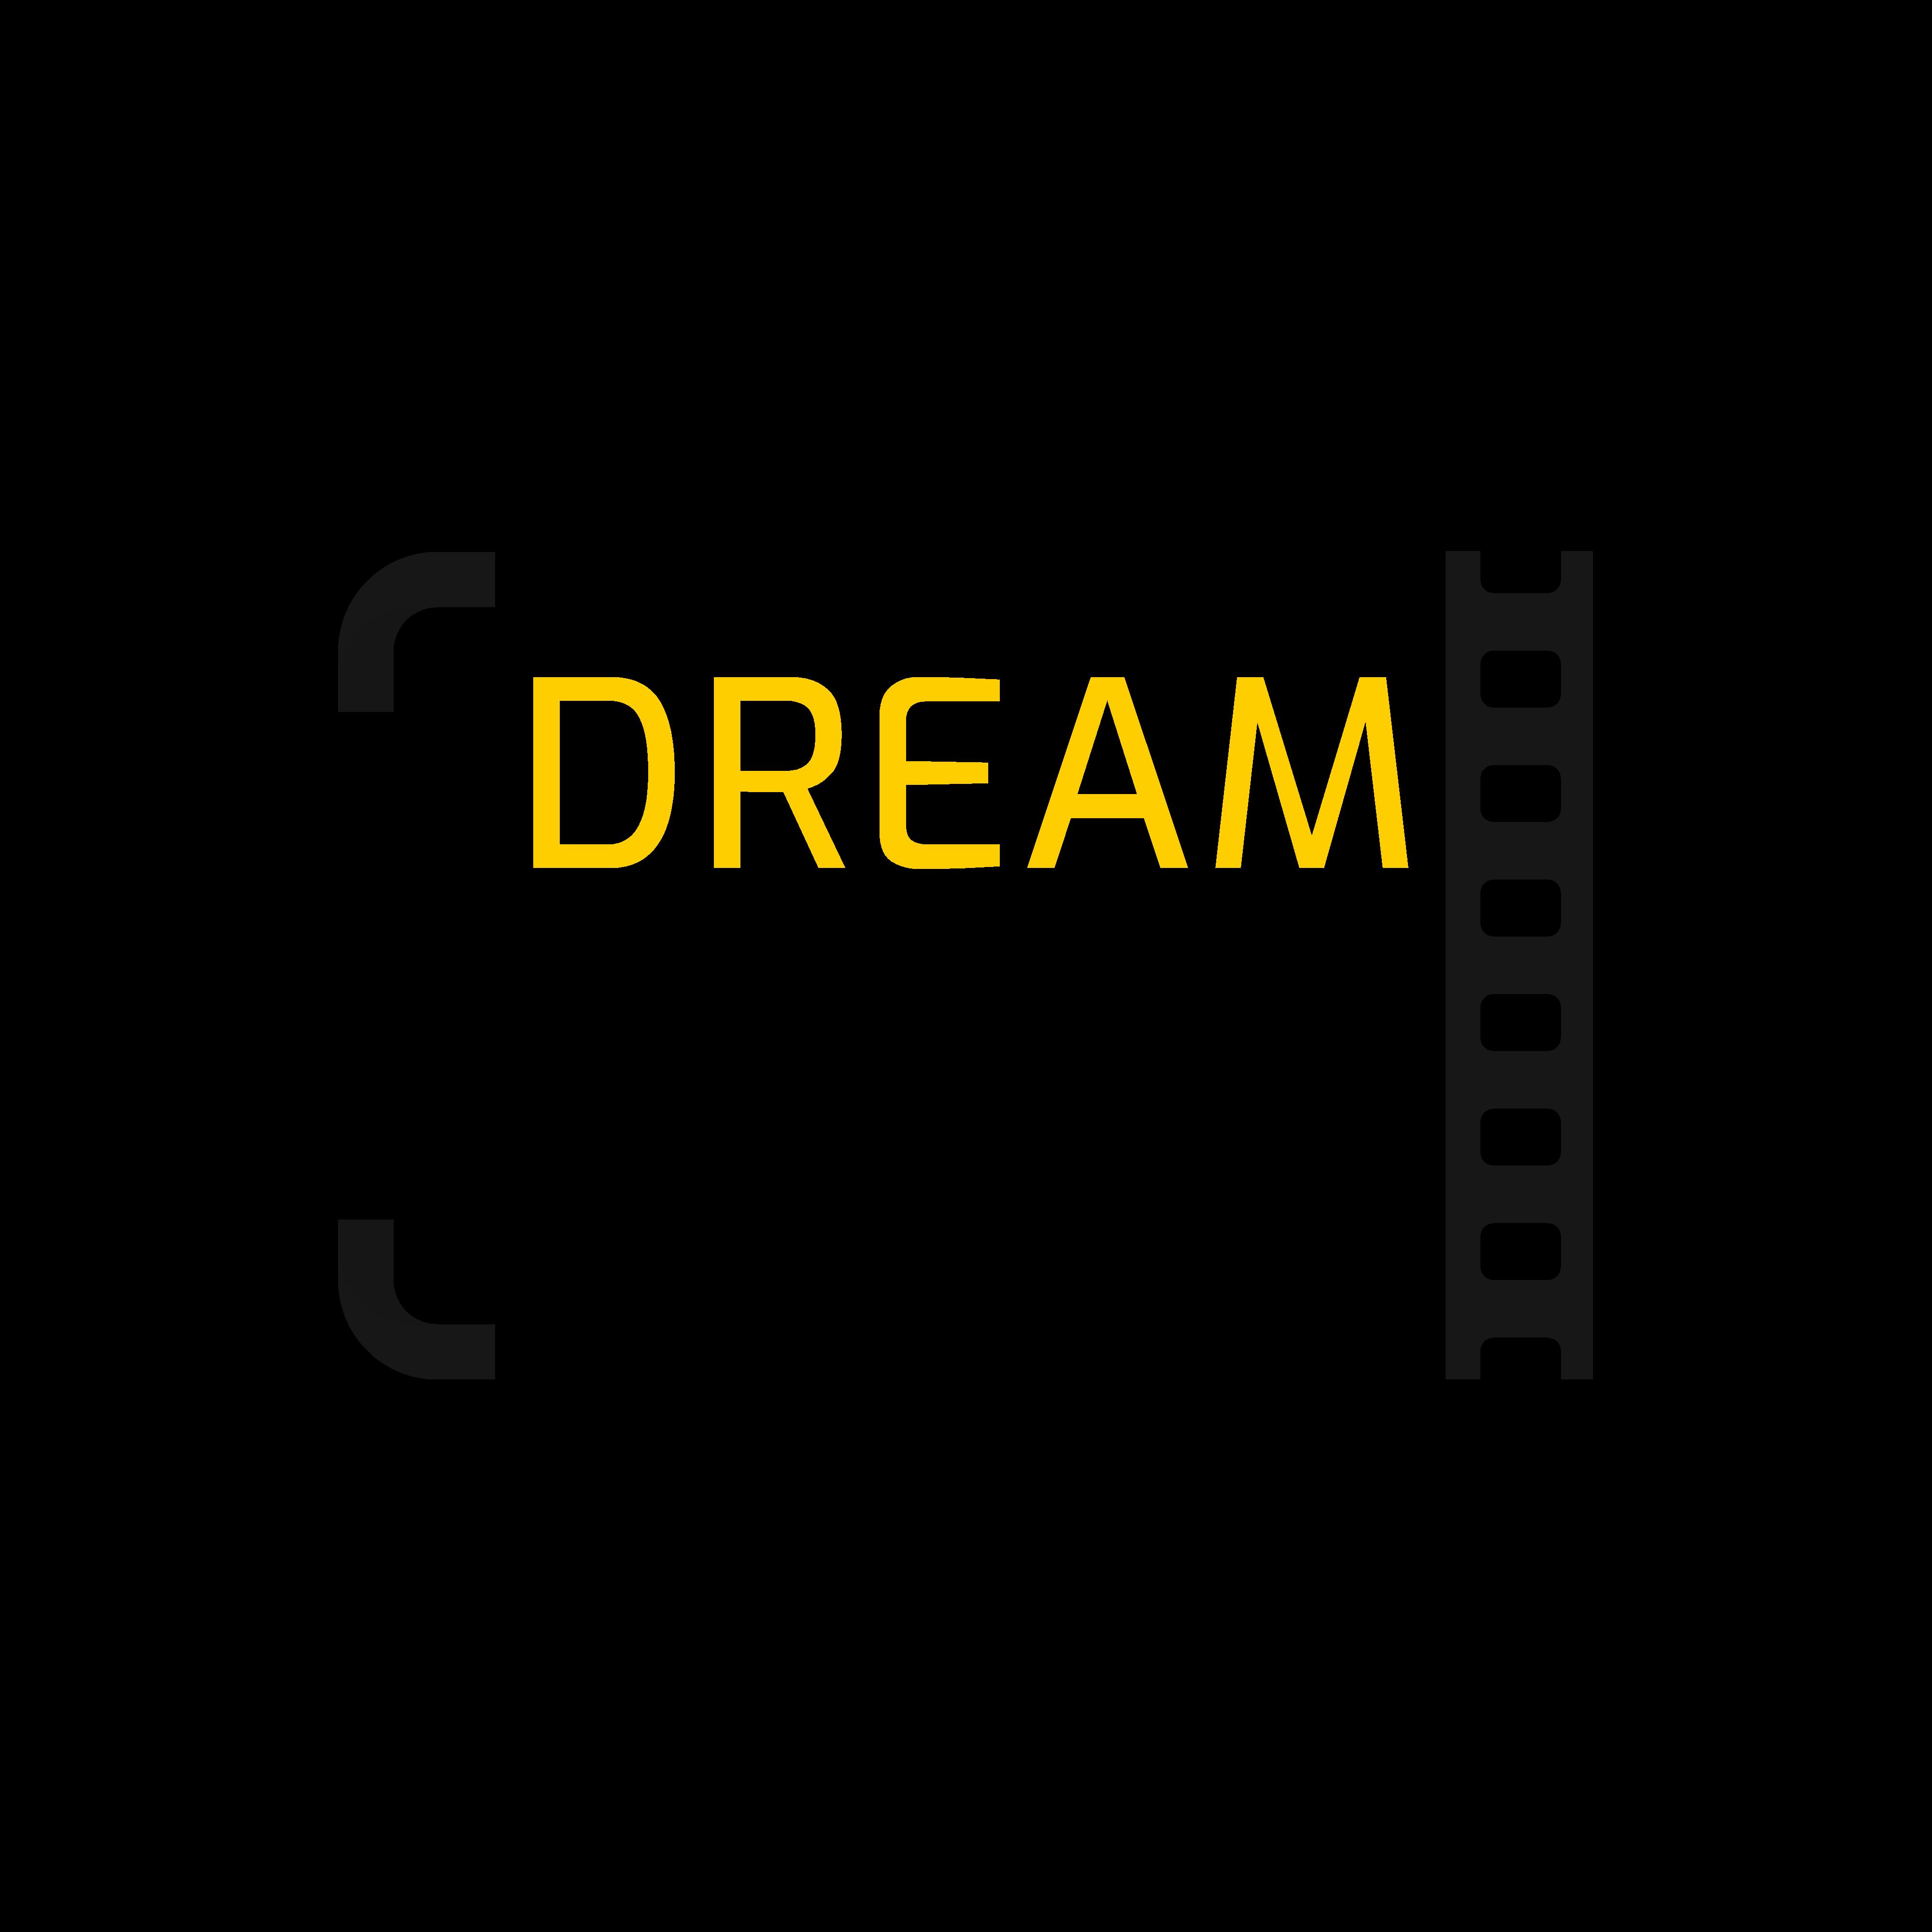 David Dreambular